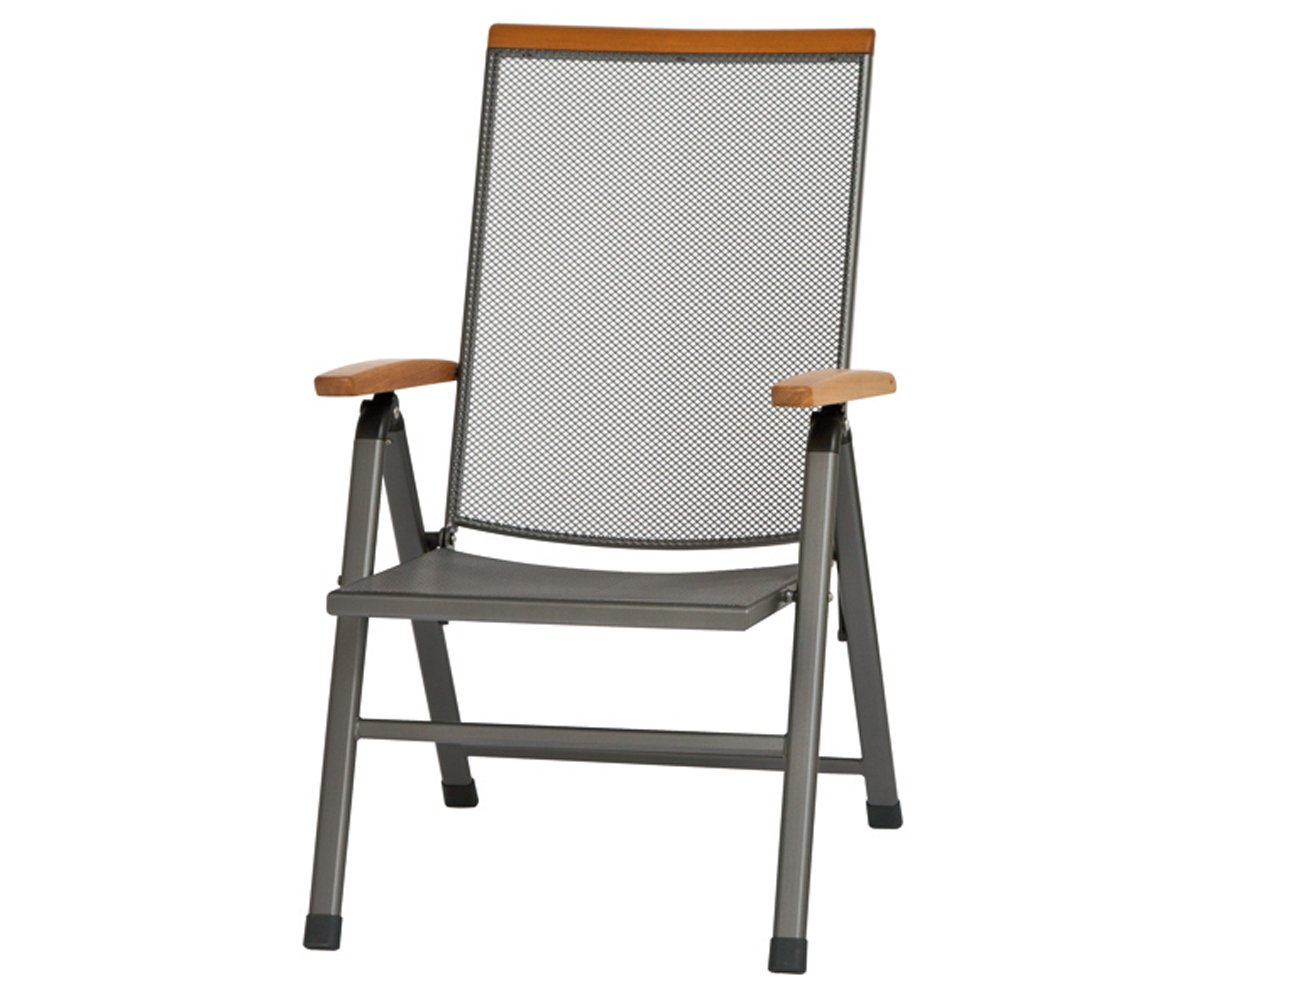 siena garden 680396 klappsessel materia eisengrau l 62 x b 62 x h 103 5 cm online kaufen. Black Bedroom Furniture Sets. Home Design Ideas